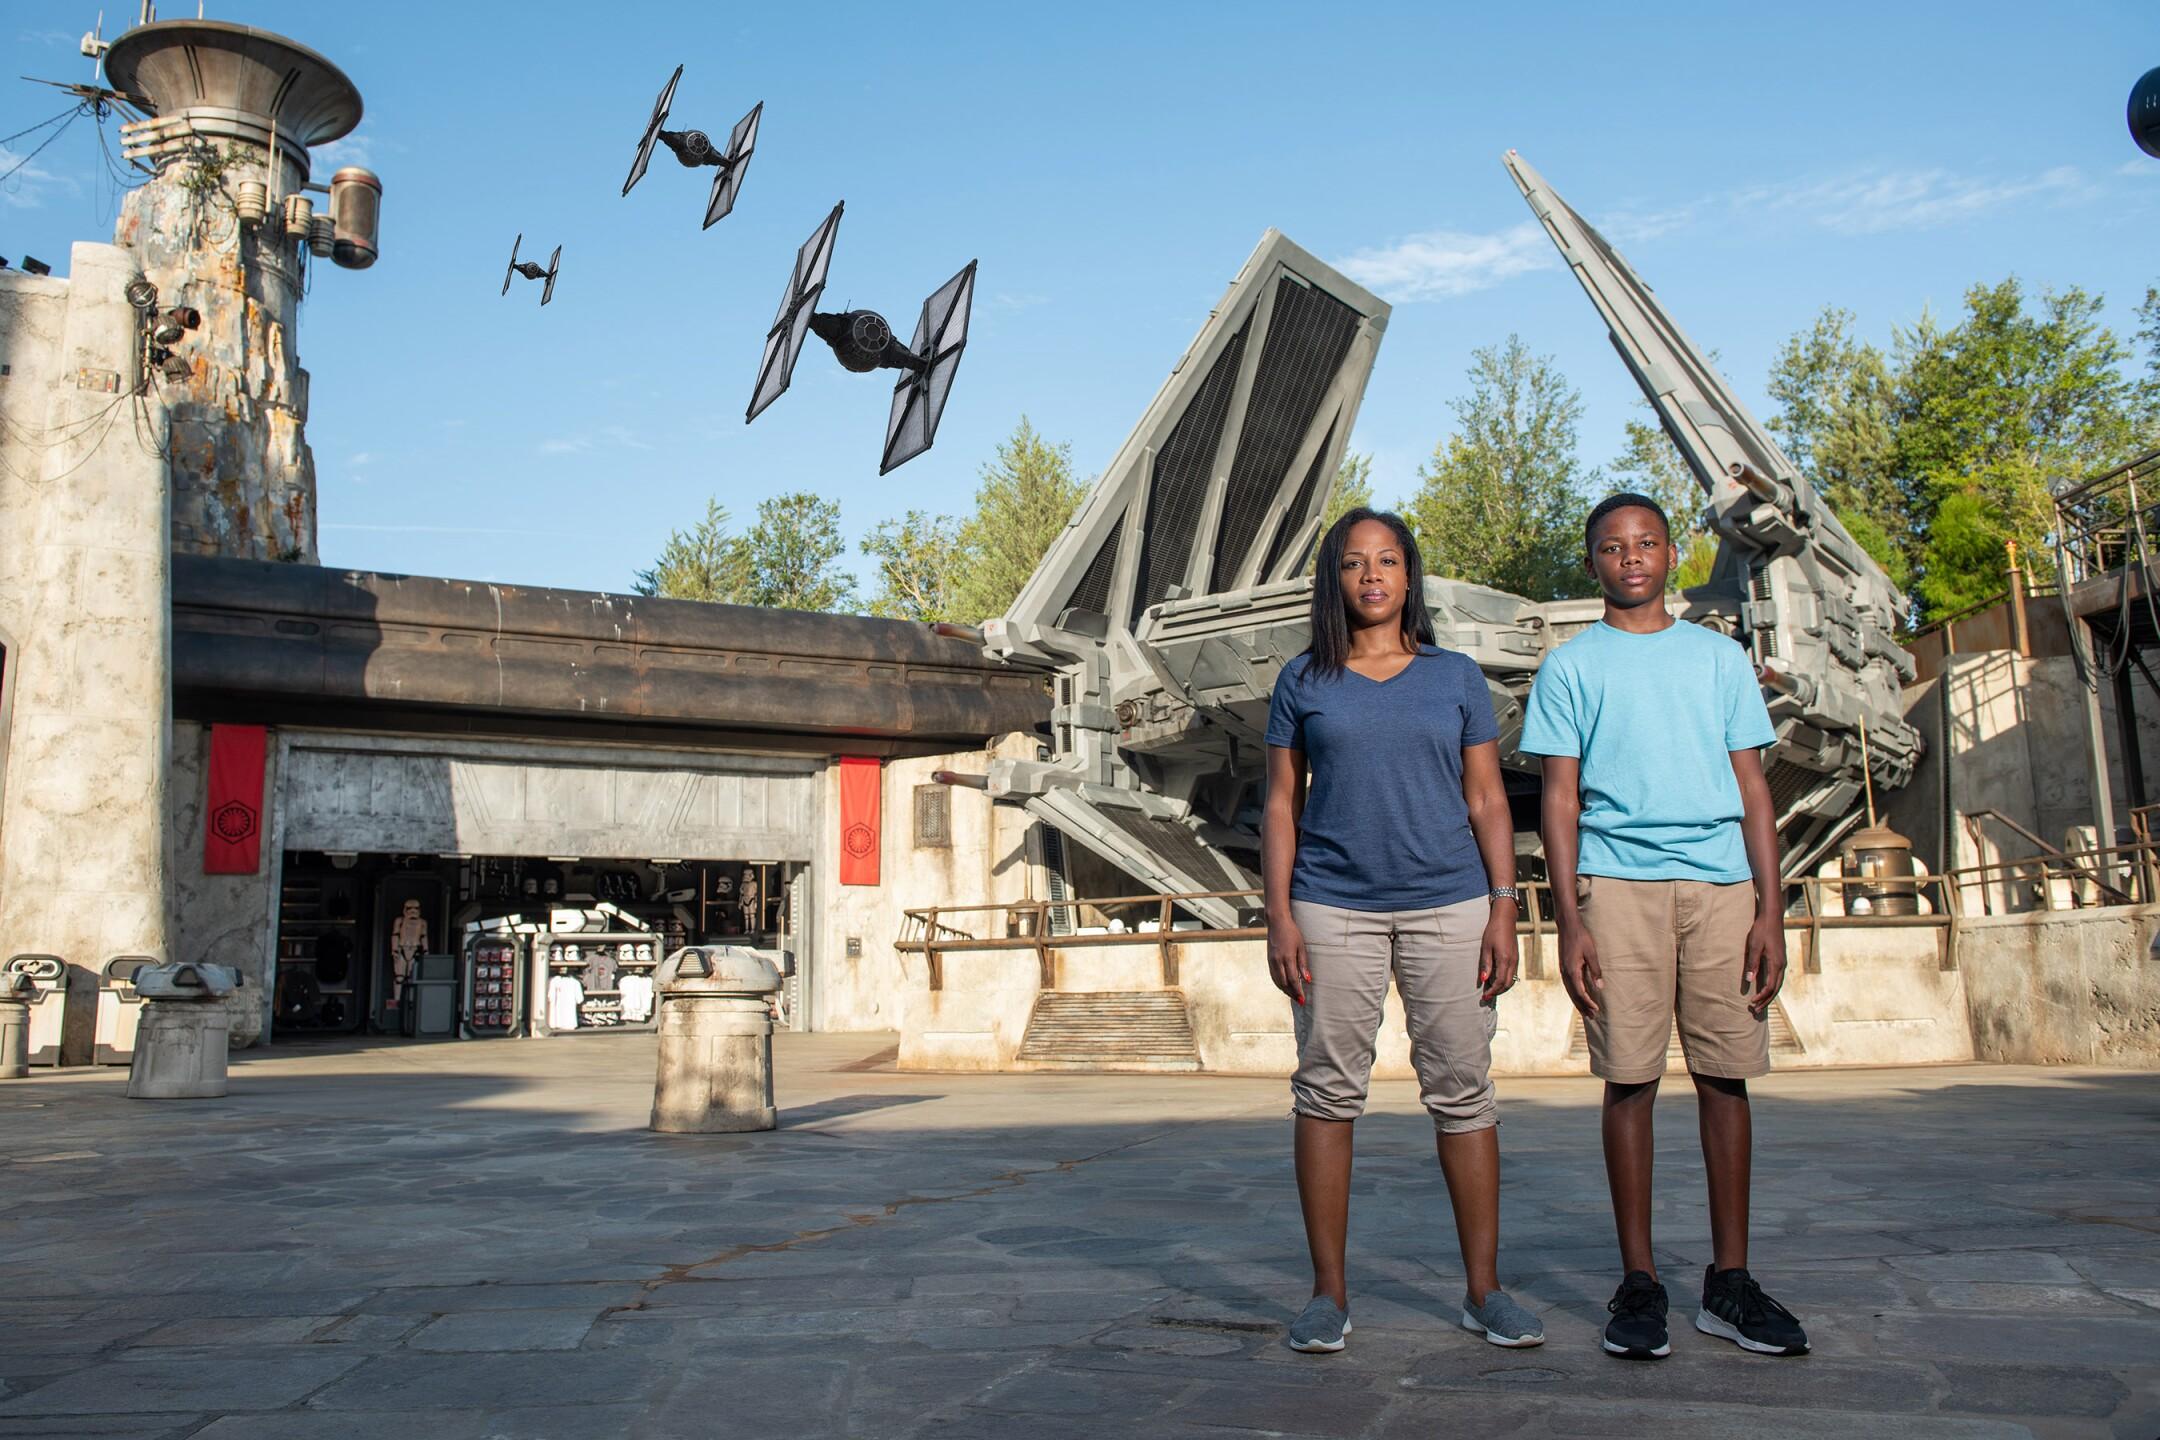 Disney PhotoPass Aerial Animated Magic Shot in Star Wars: Galaxy